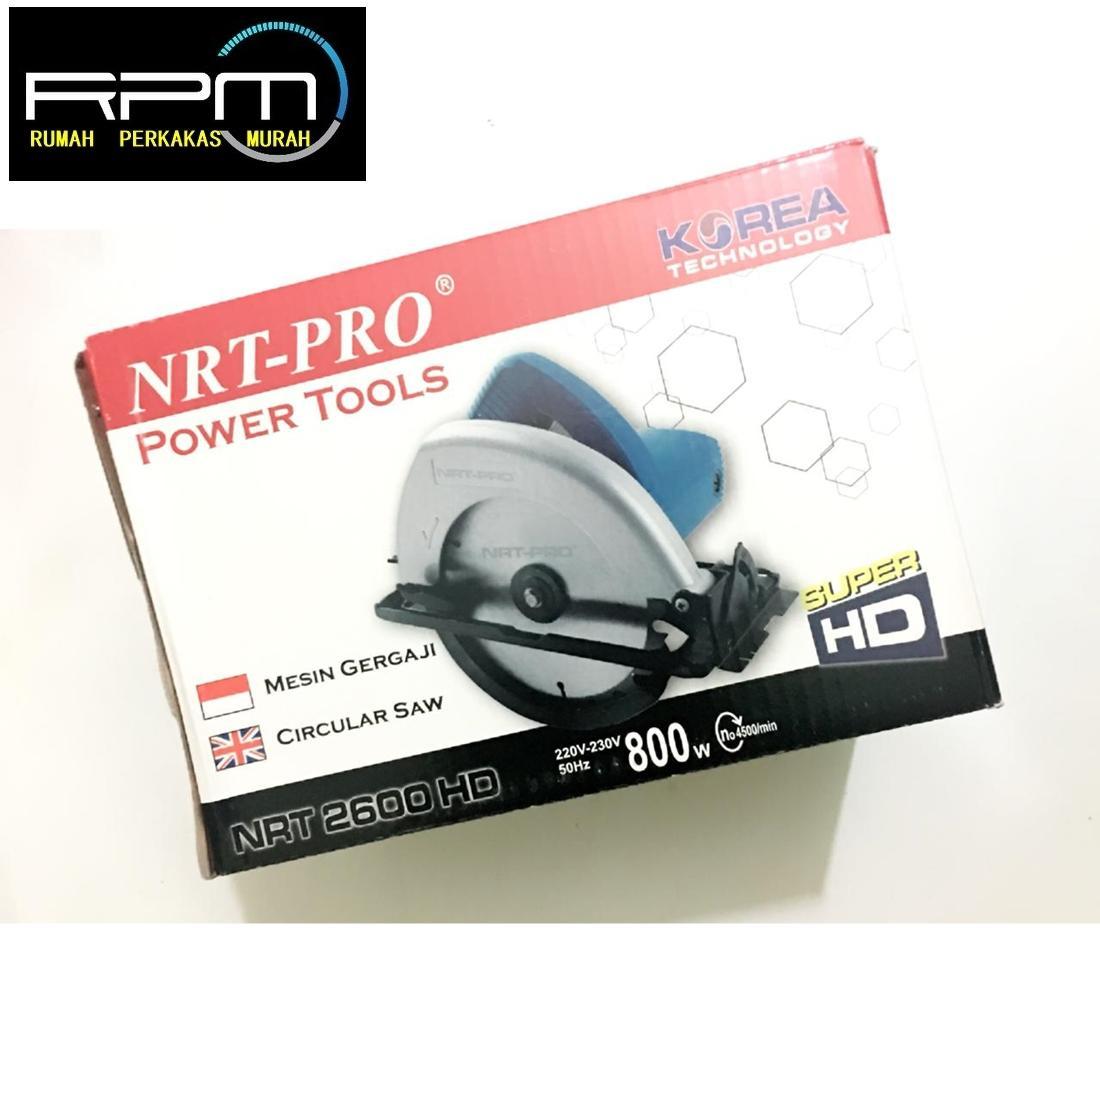 Jual Gergaji Listrik Terbaru Mesin Scroll Saw Dremel Moto Ms20 01 Potong Kayu 7 Inch Cirkle 2600hd Nrt Pro